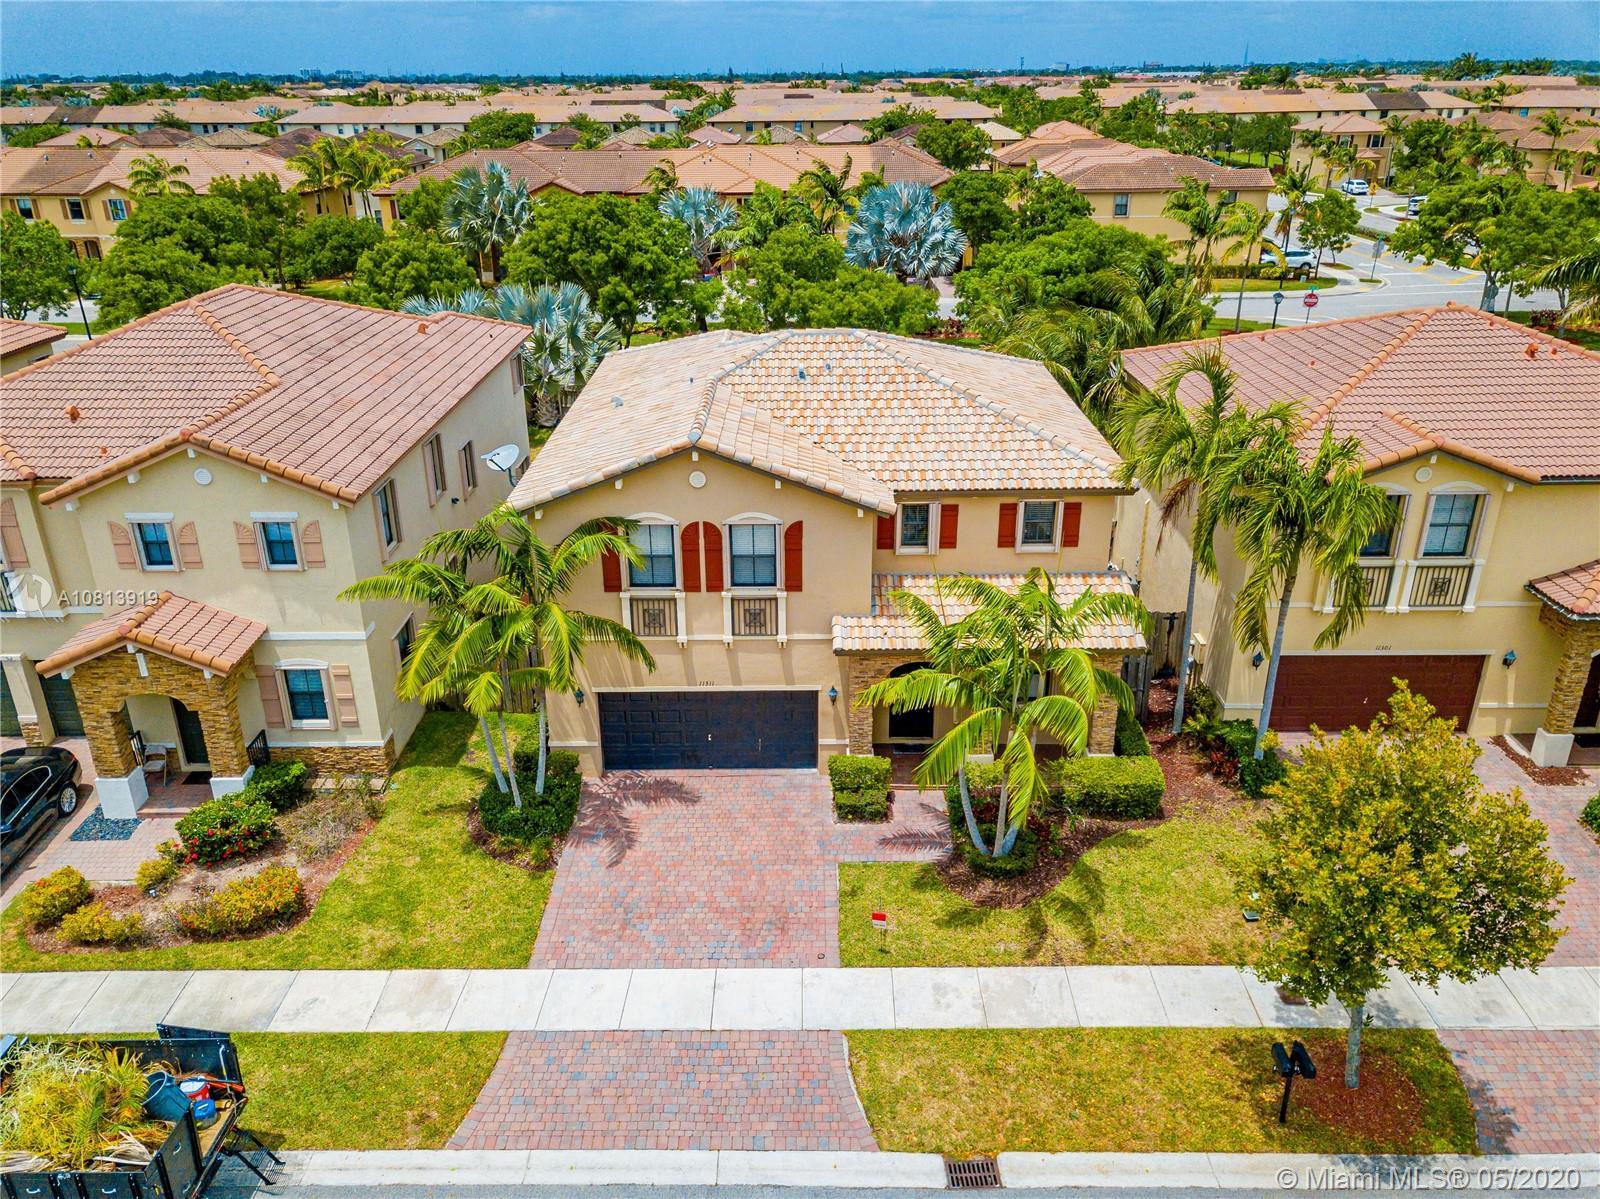 11311 SW 240th Ln, Homestead, FL 33032 - Homestead, FL real estate listing